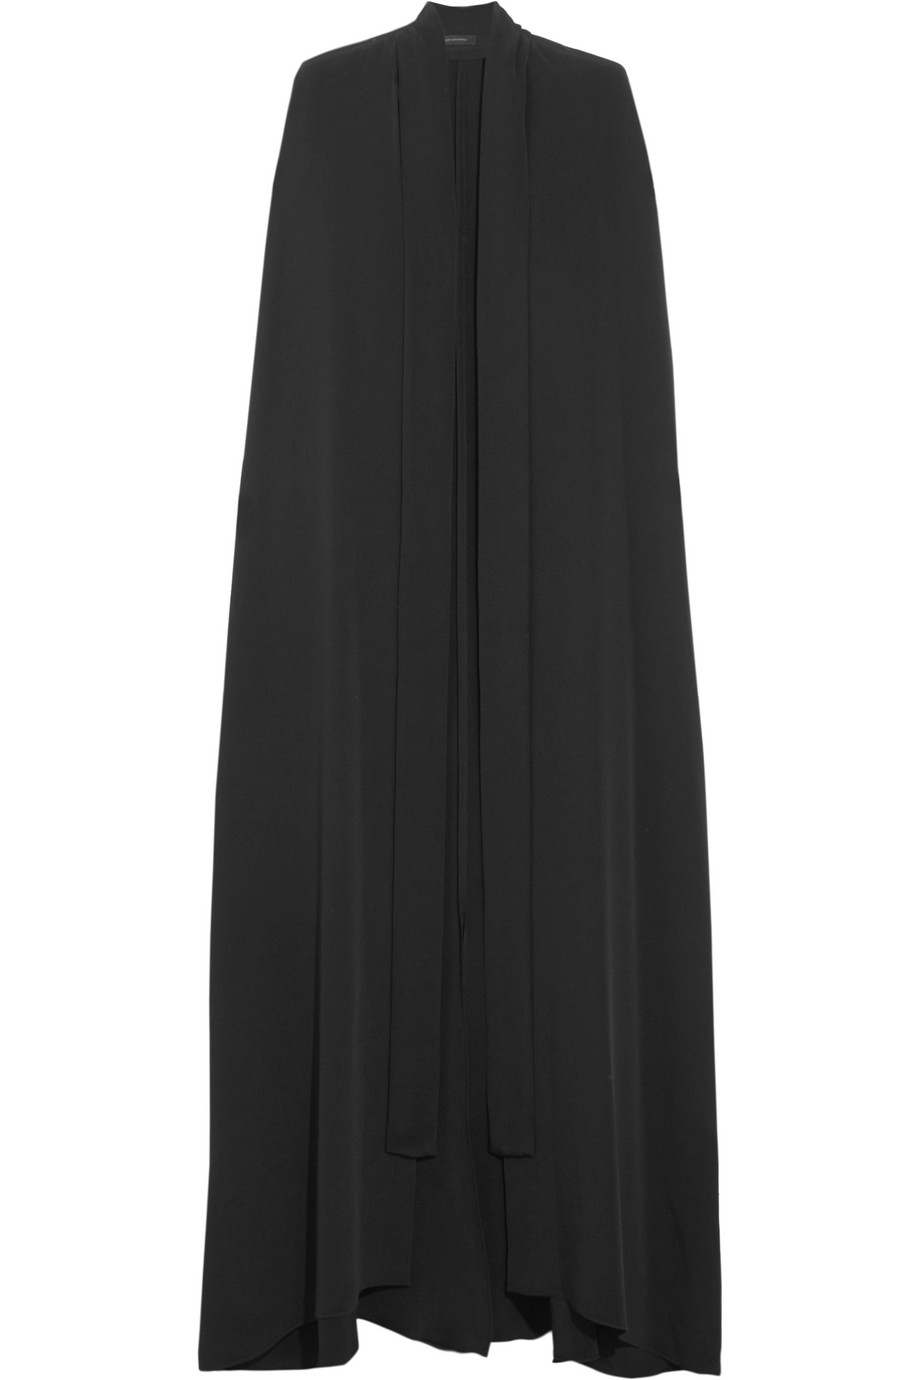 Avalon Silk-Crepe Cape, Black, Women's, Size: 4